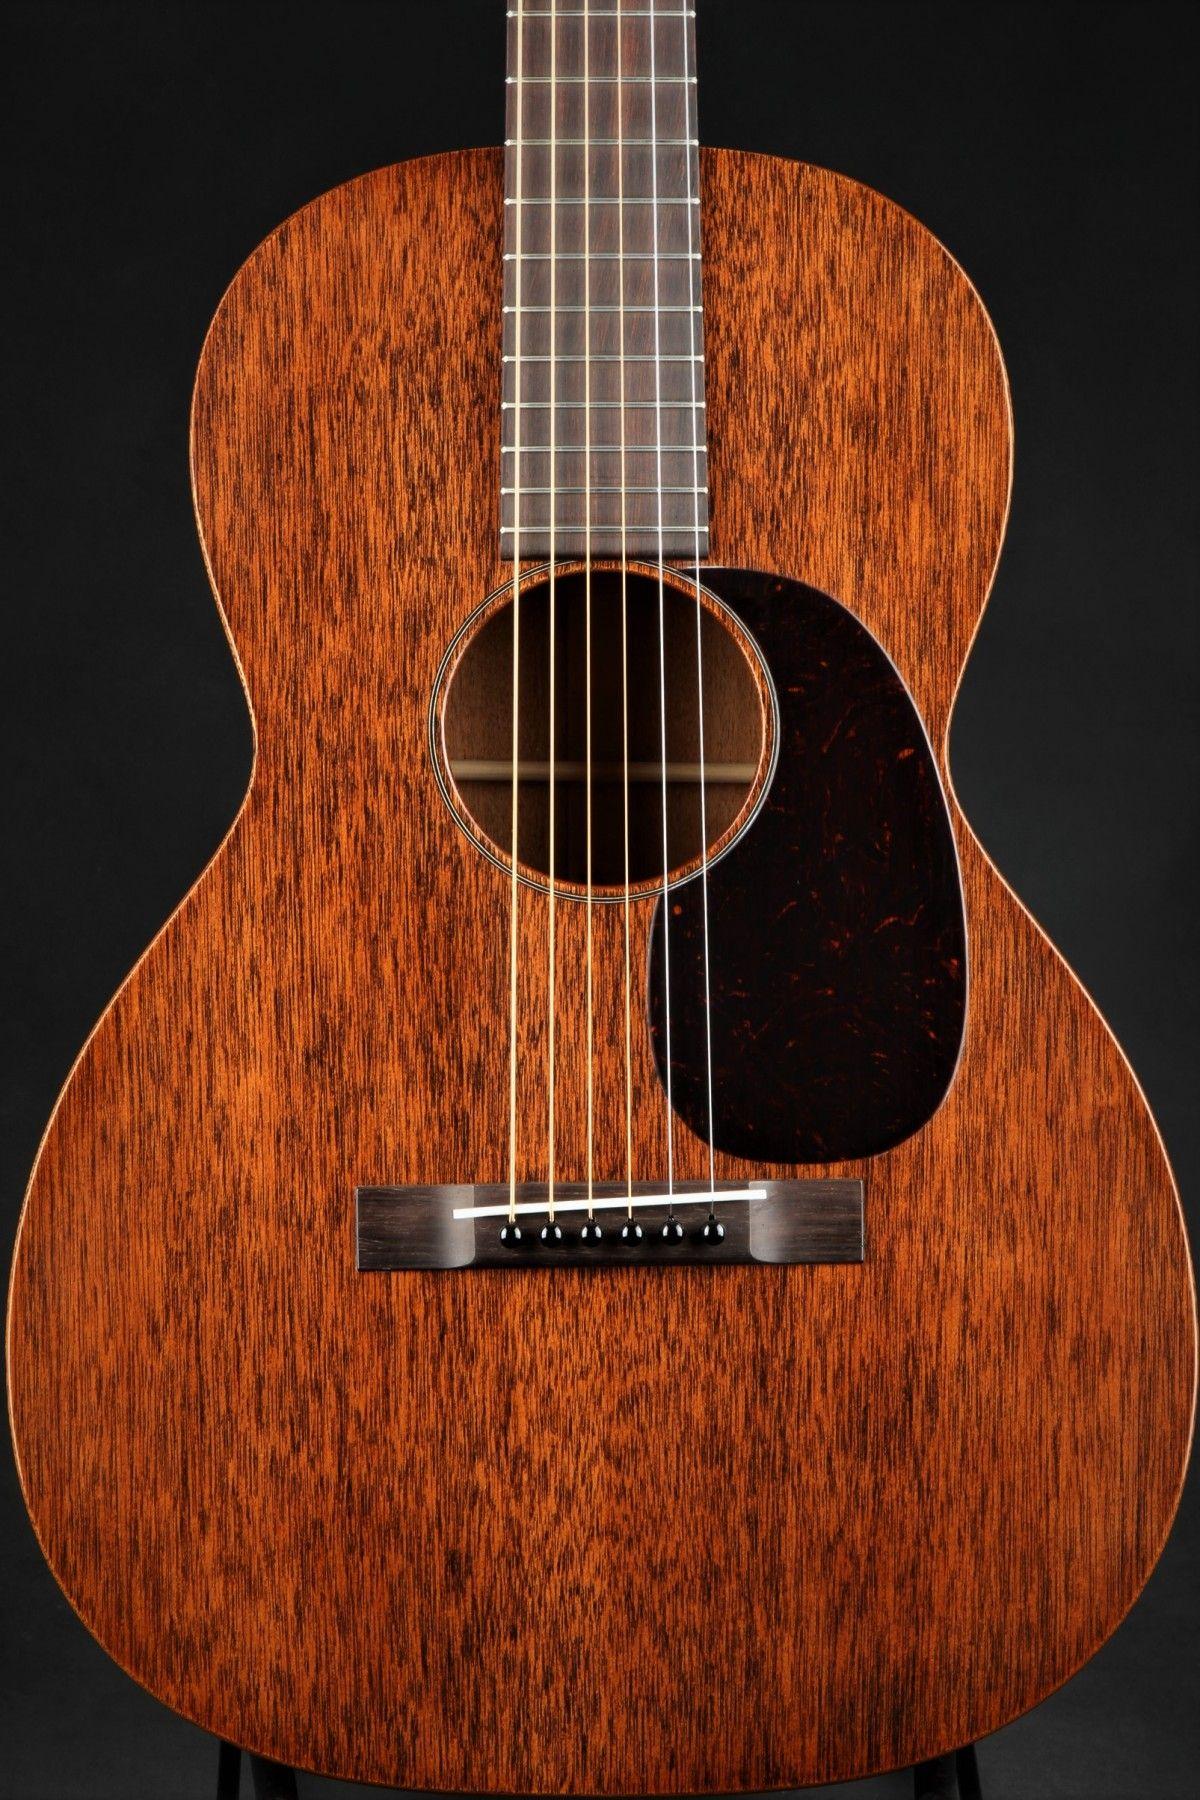 Martin 00 17 Authentic 1931 Vts Martin Acoustic Guitar Brands Acoustic Martin Acoustic Guitar Guitar Acoustic Guitar